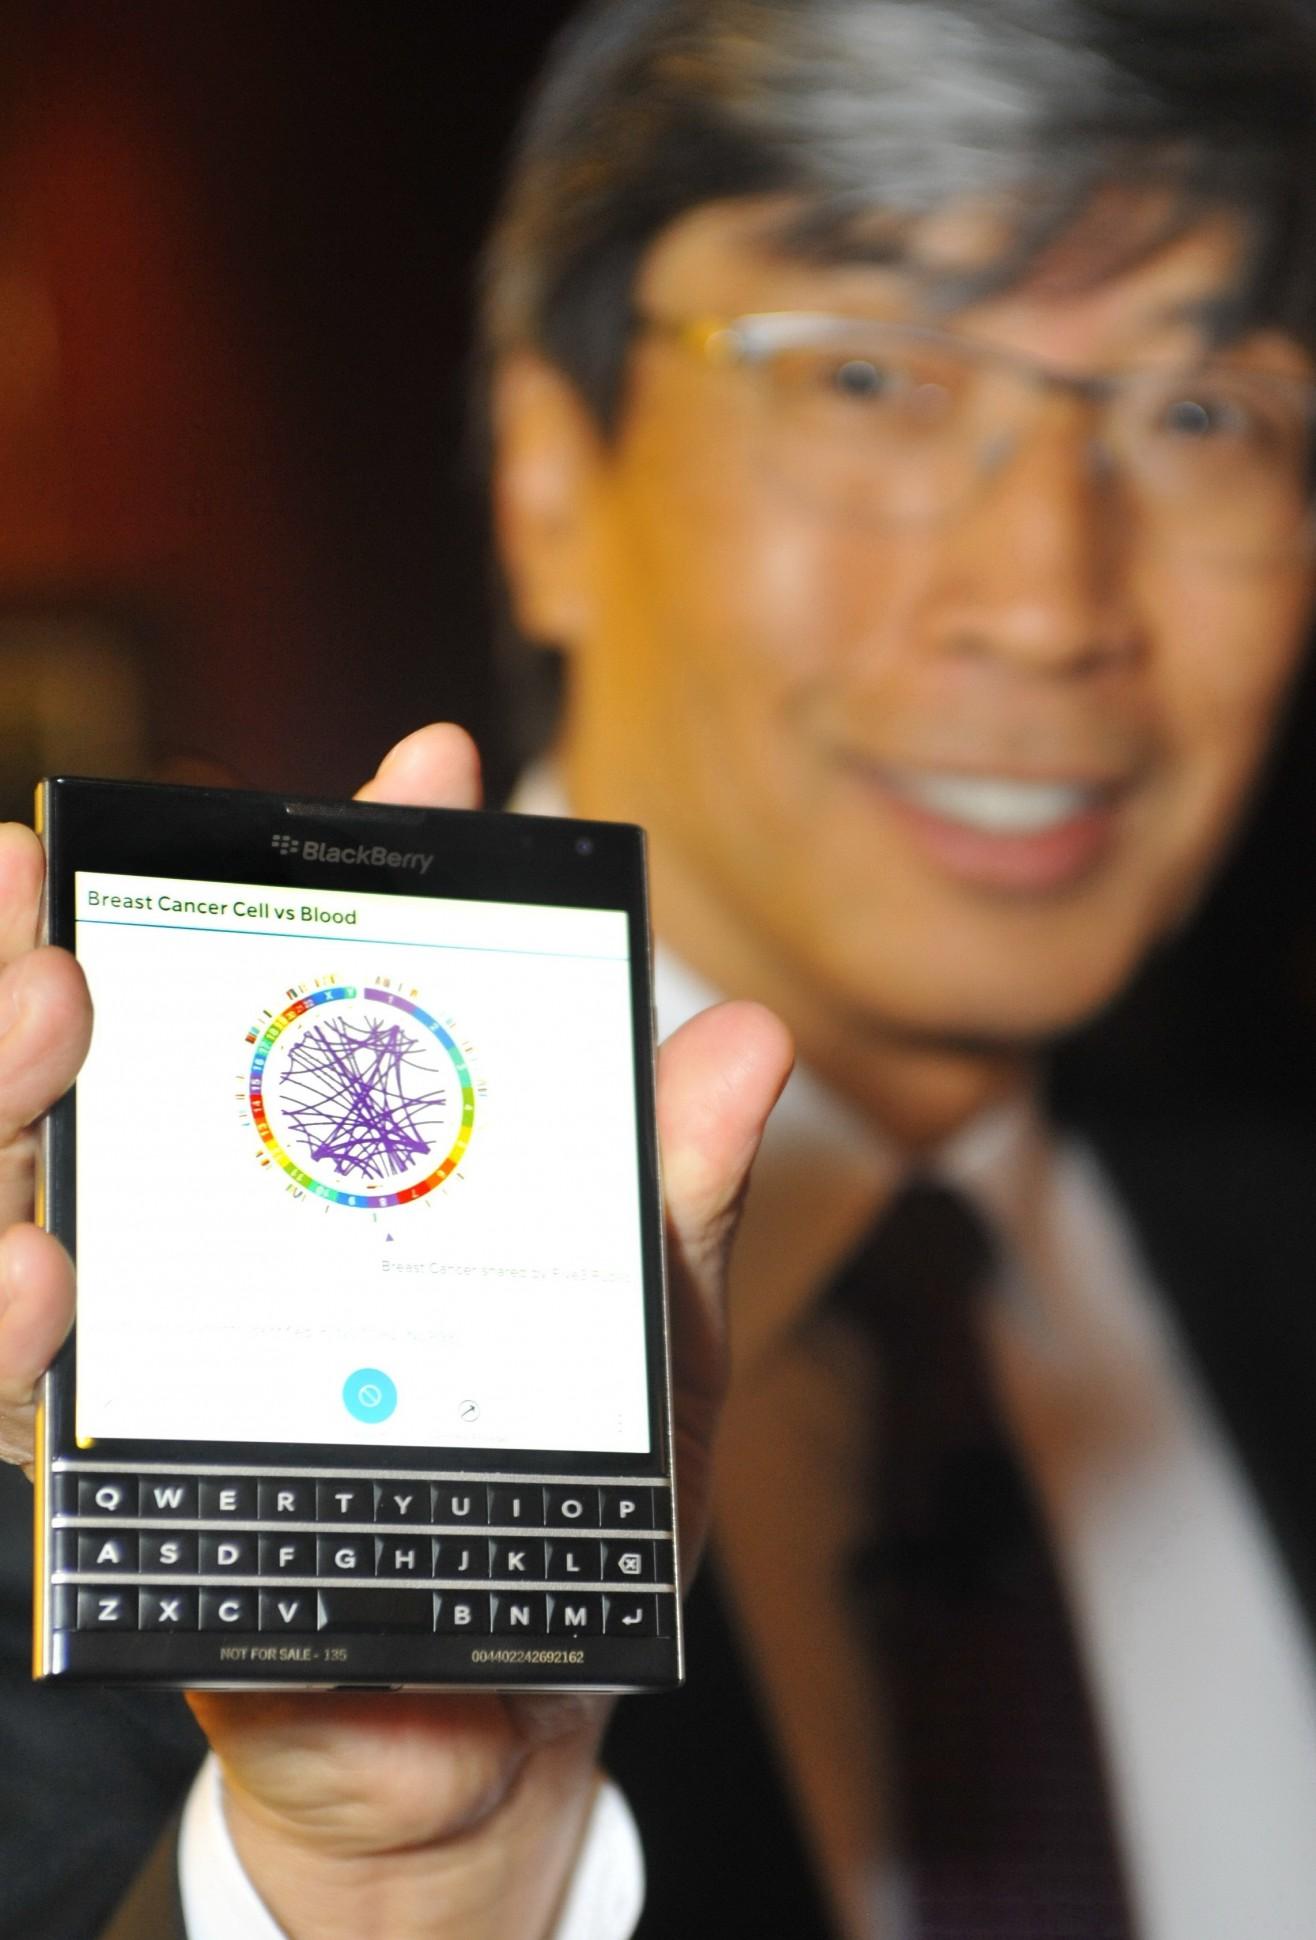 Blackberry Genome